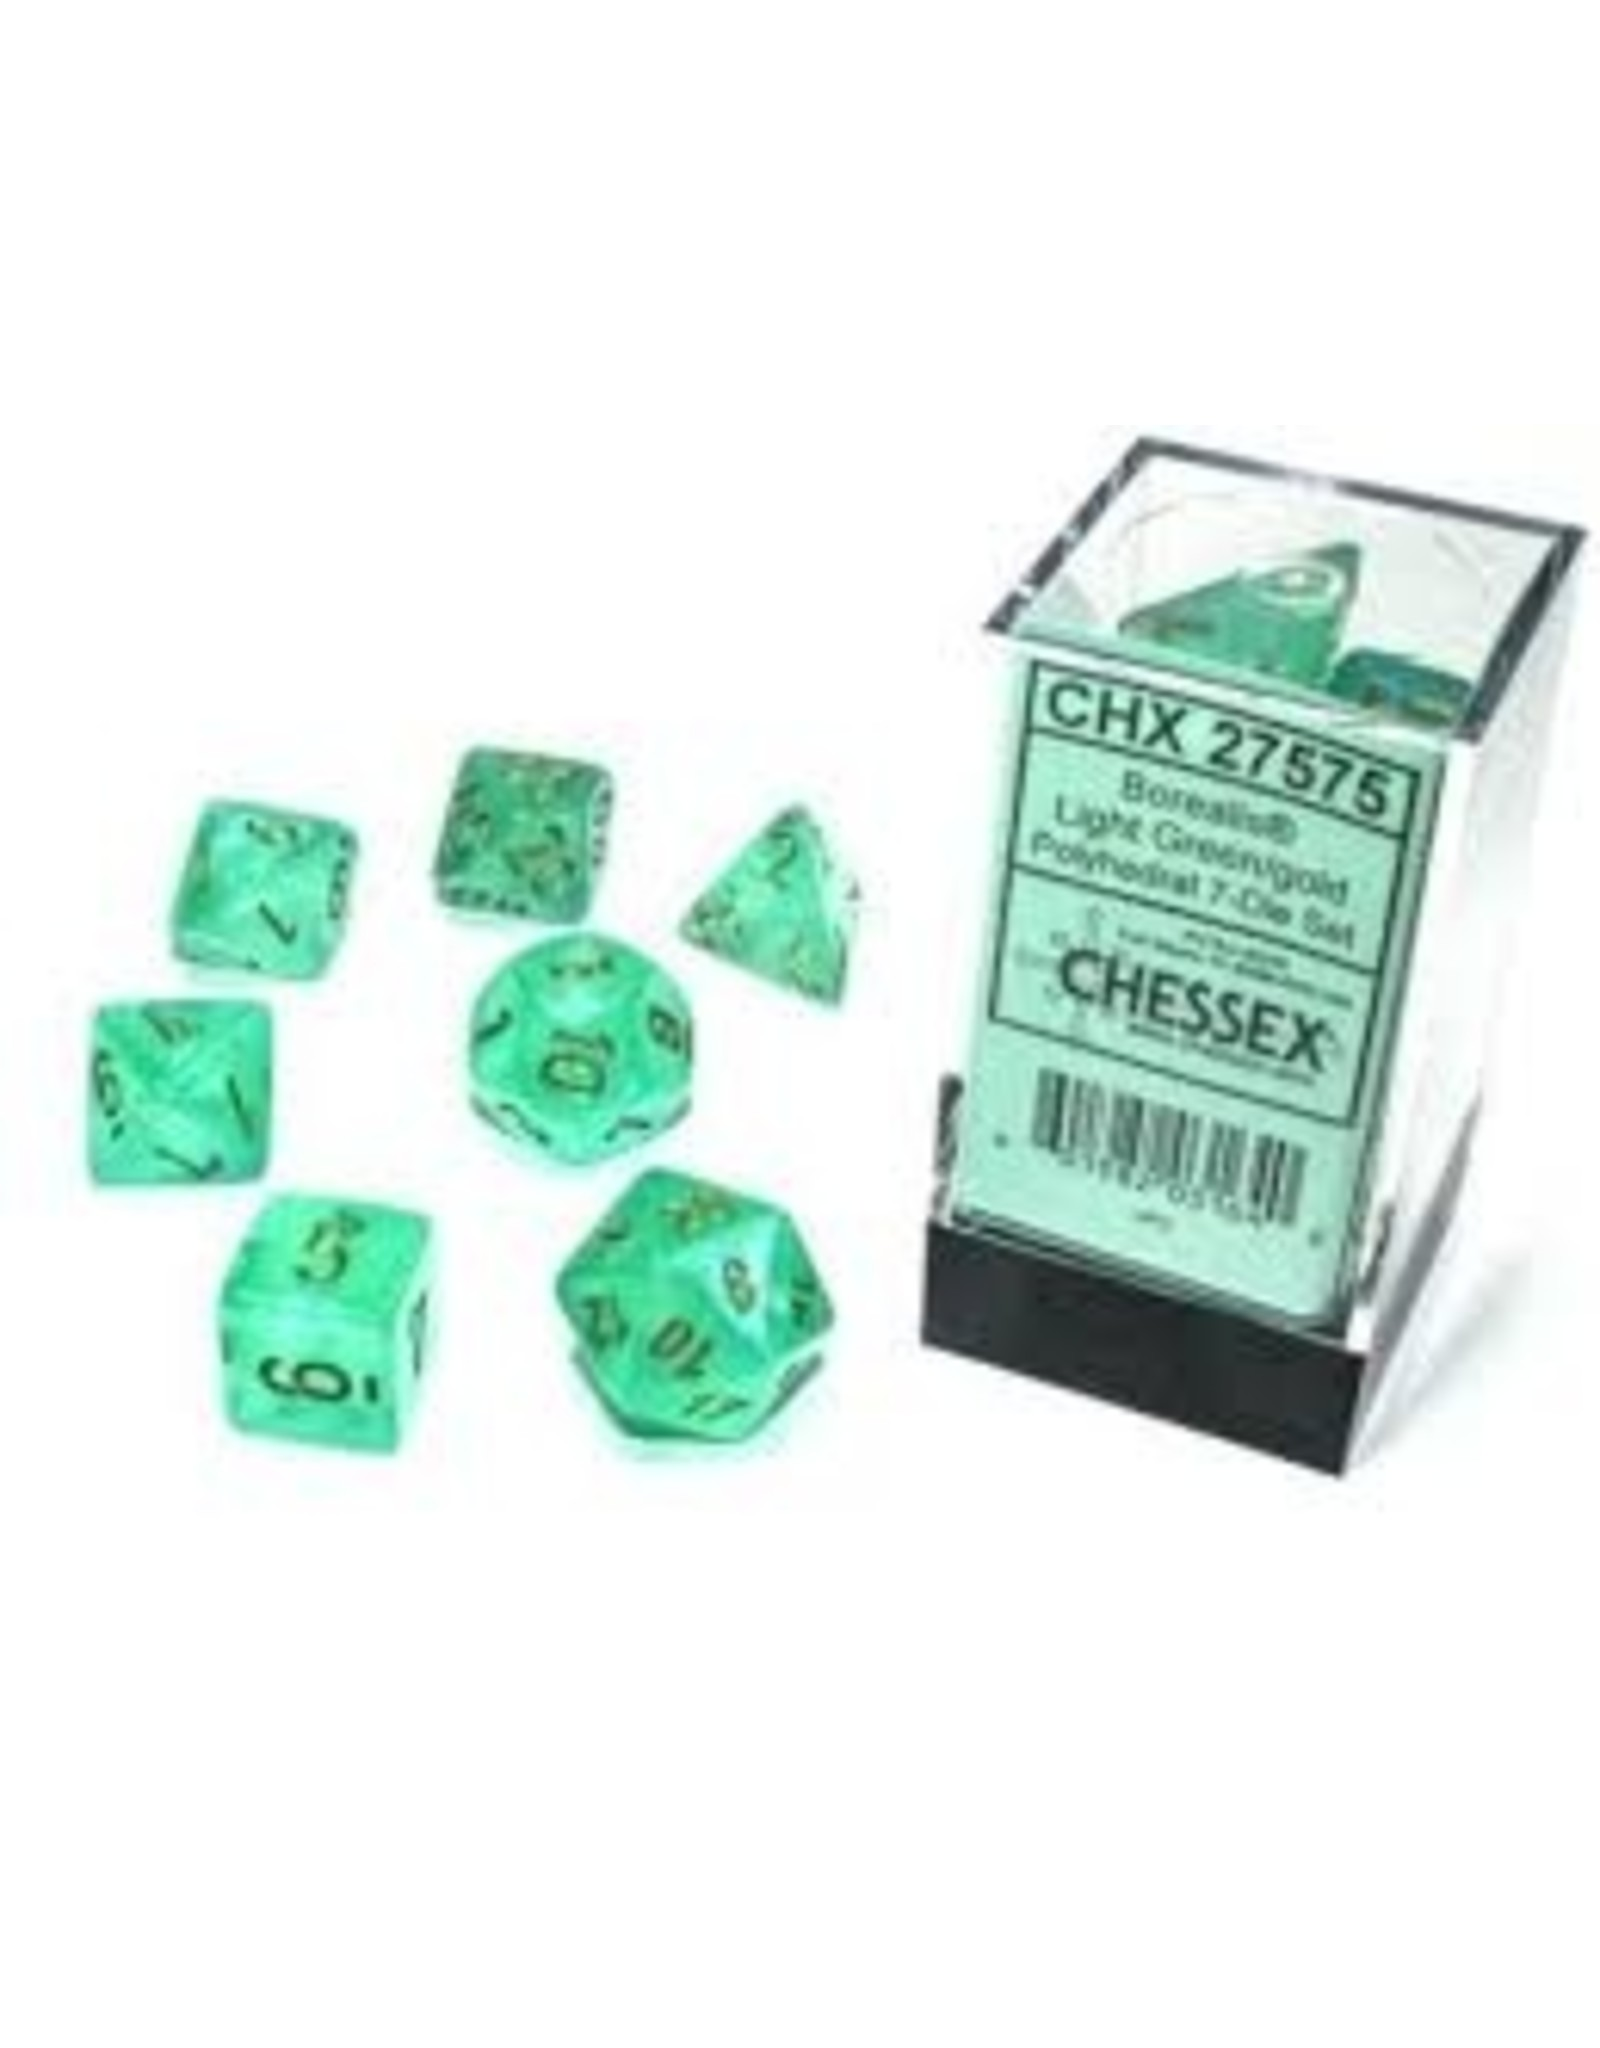 Chessex 7-SetCube Borealis Luminary LTGRgd